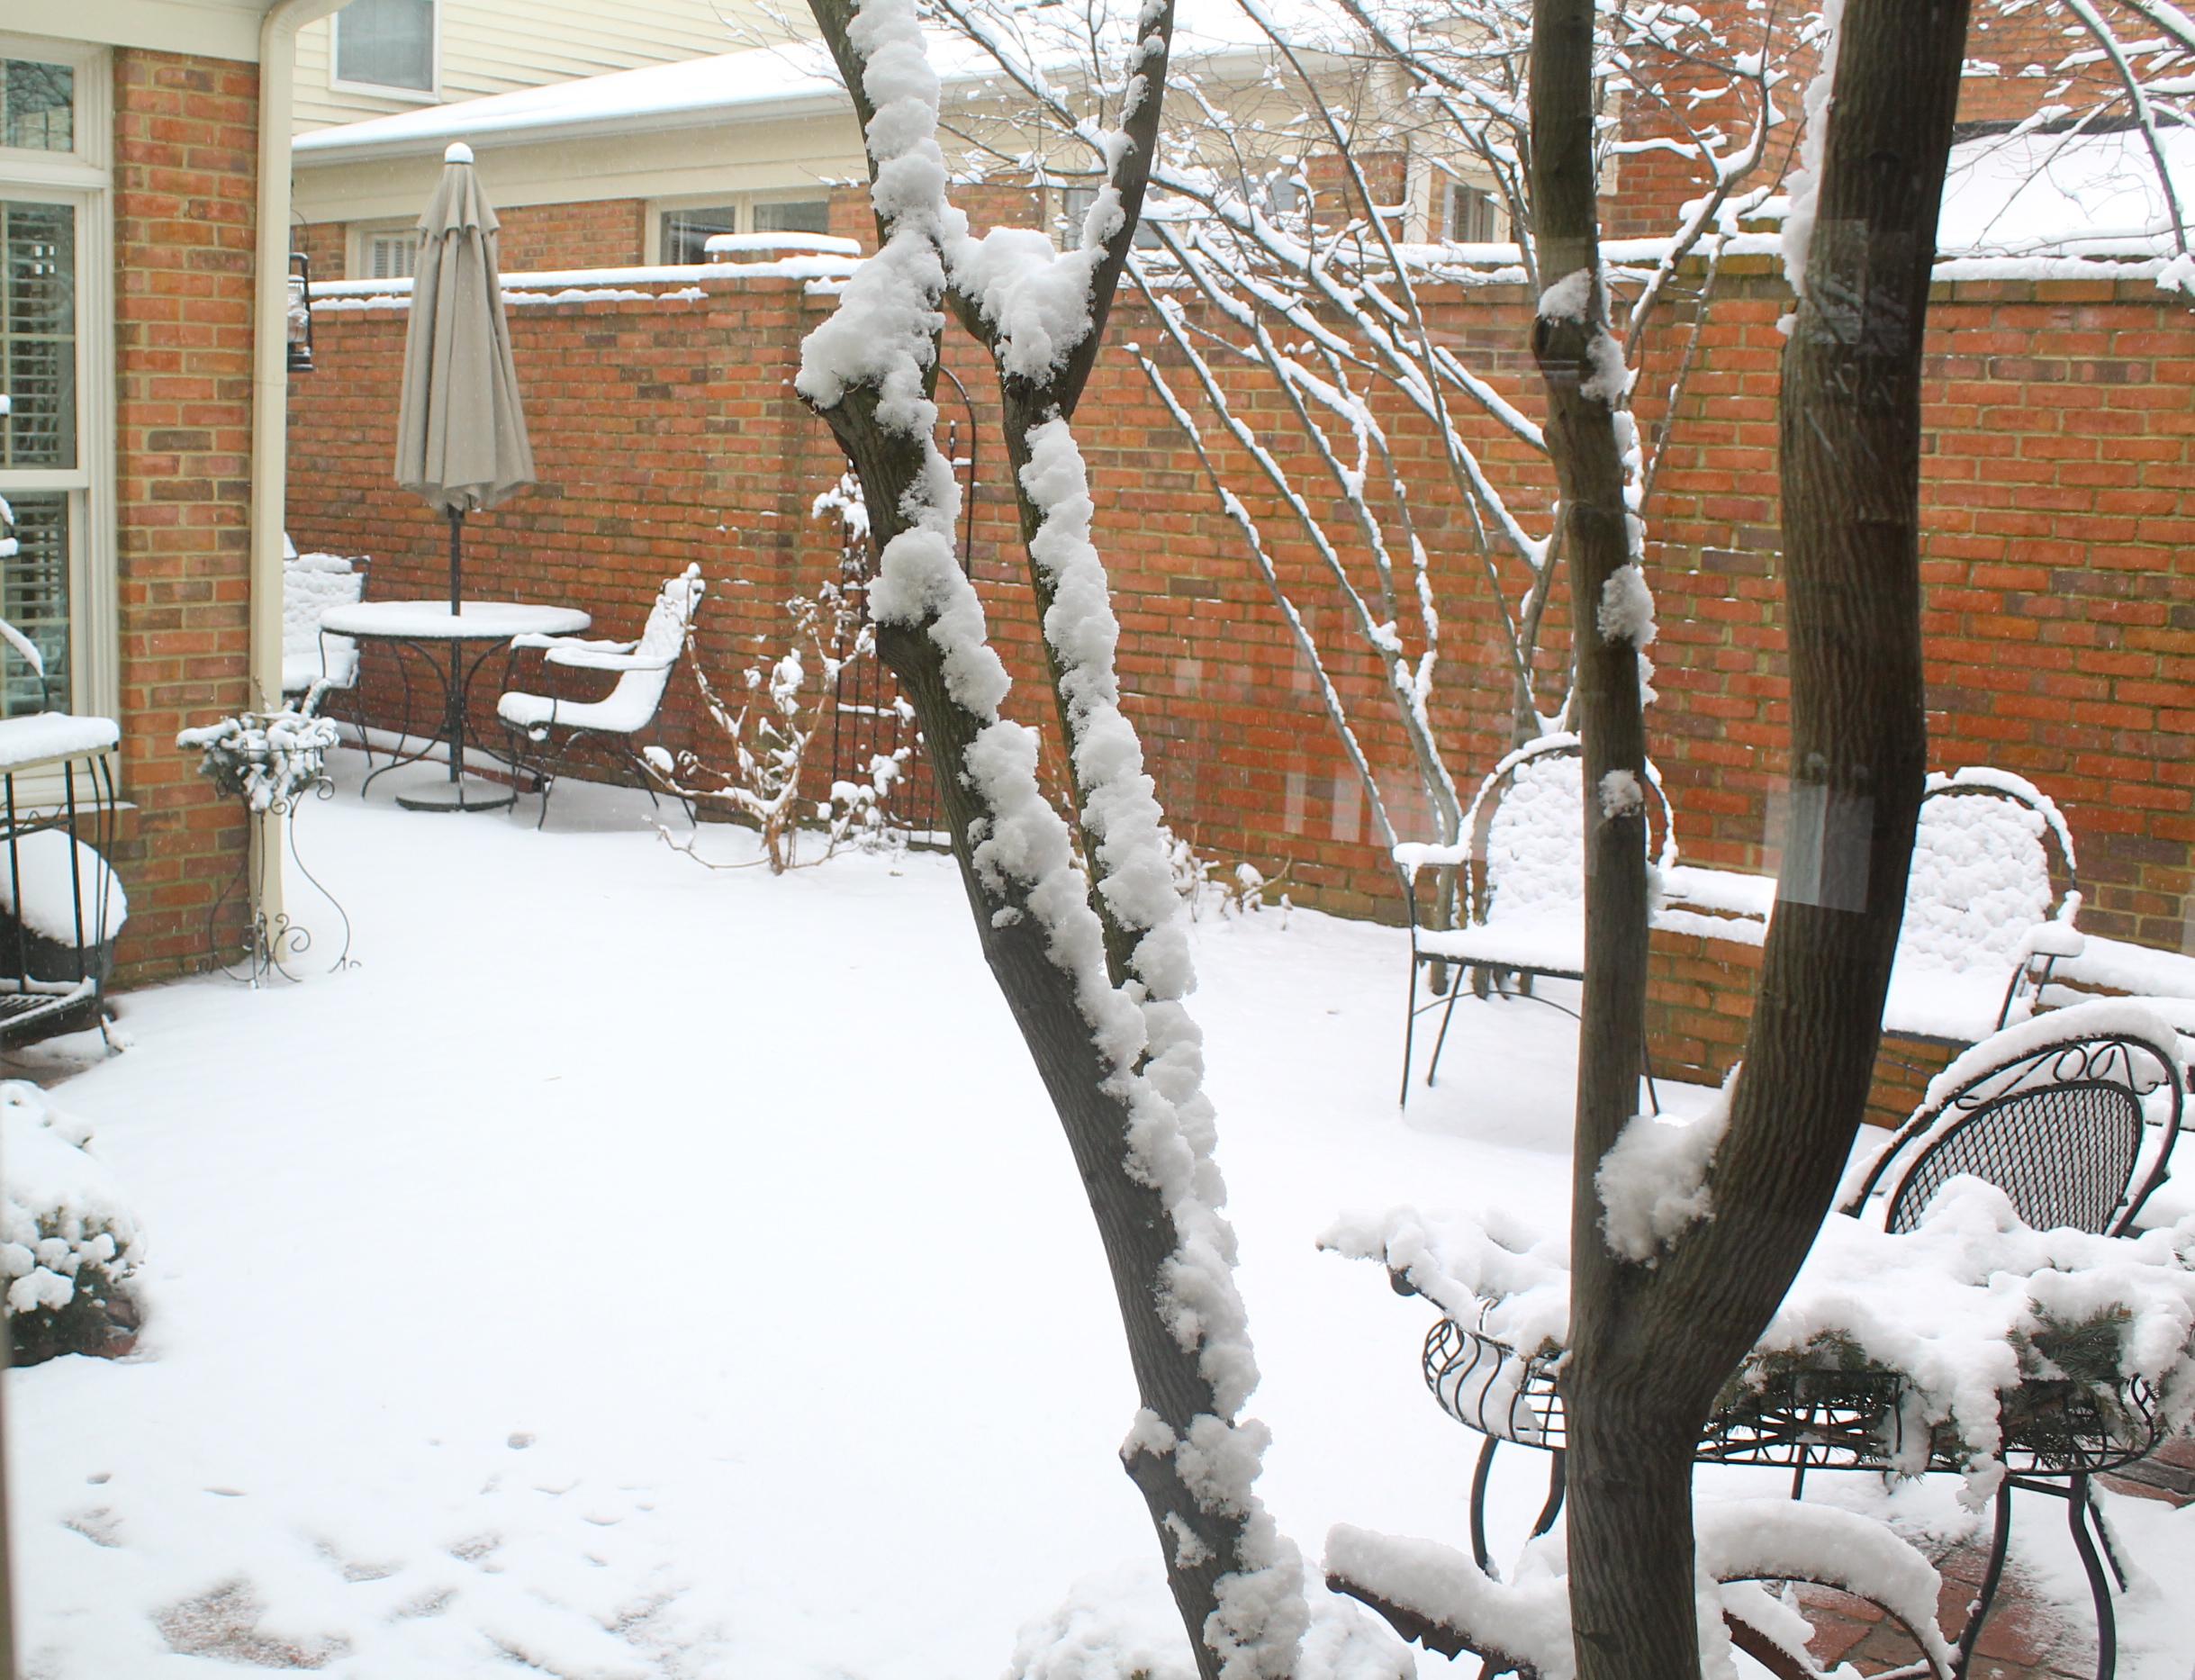 IMG 6934 - Snow Daze